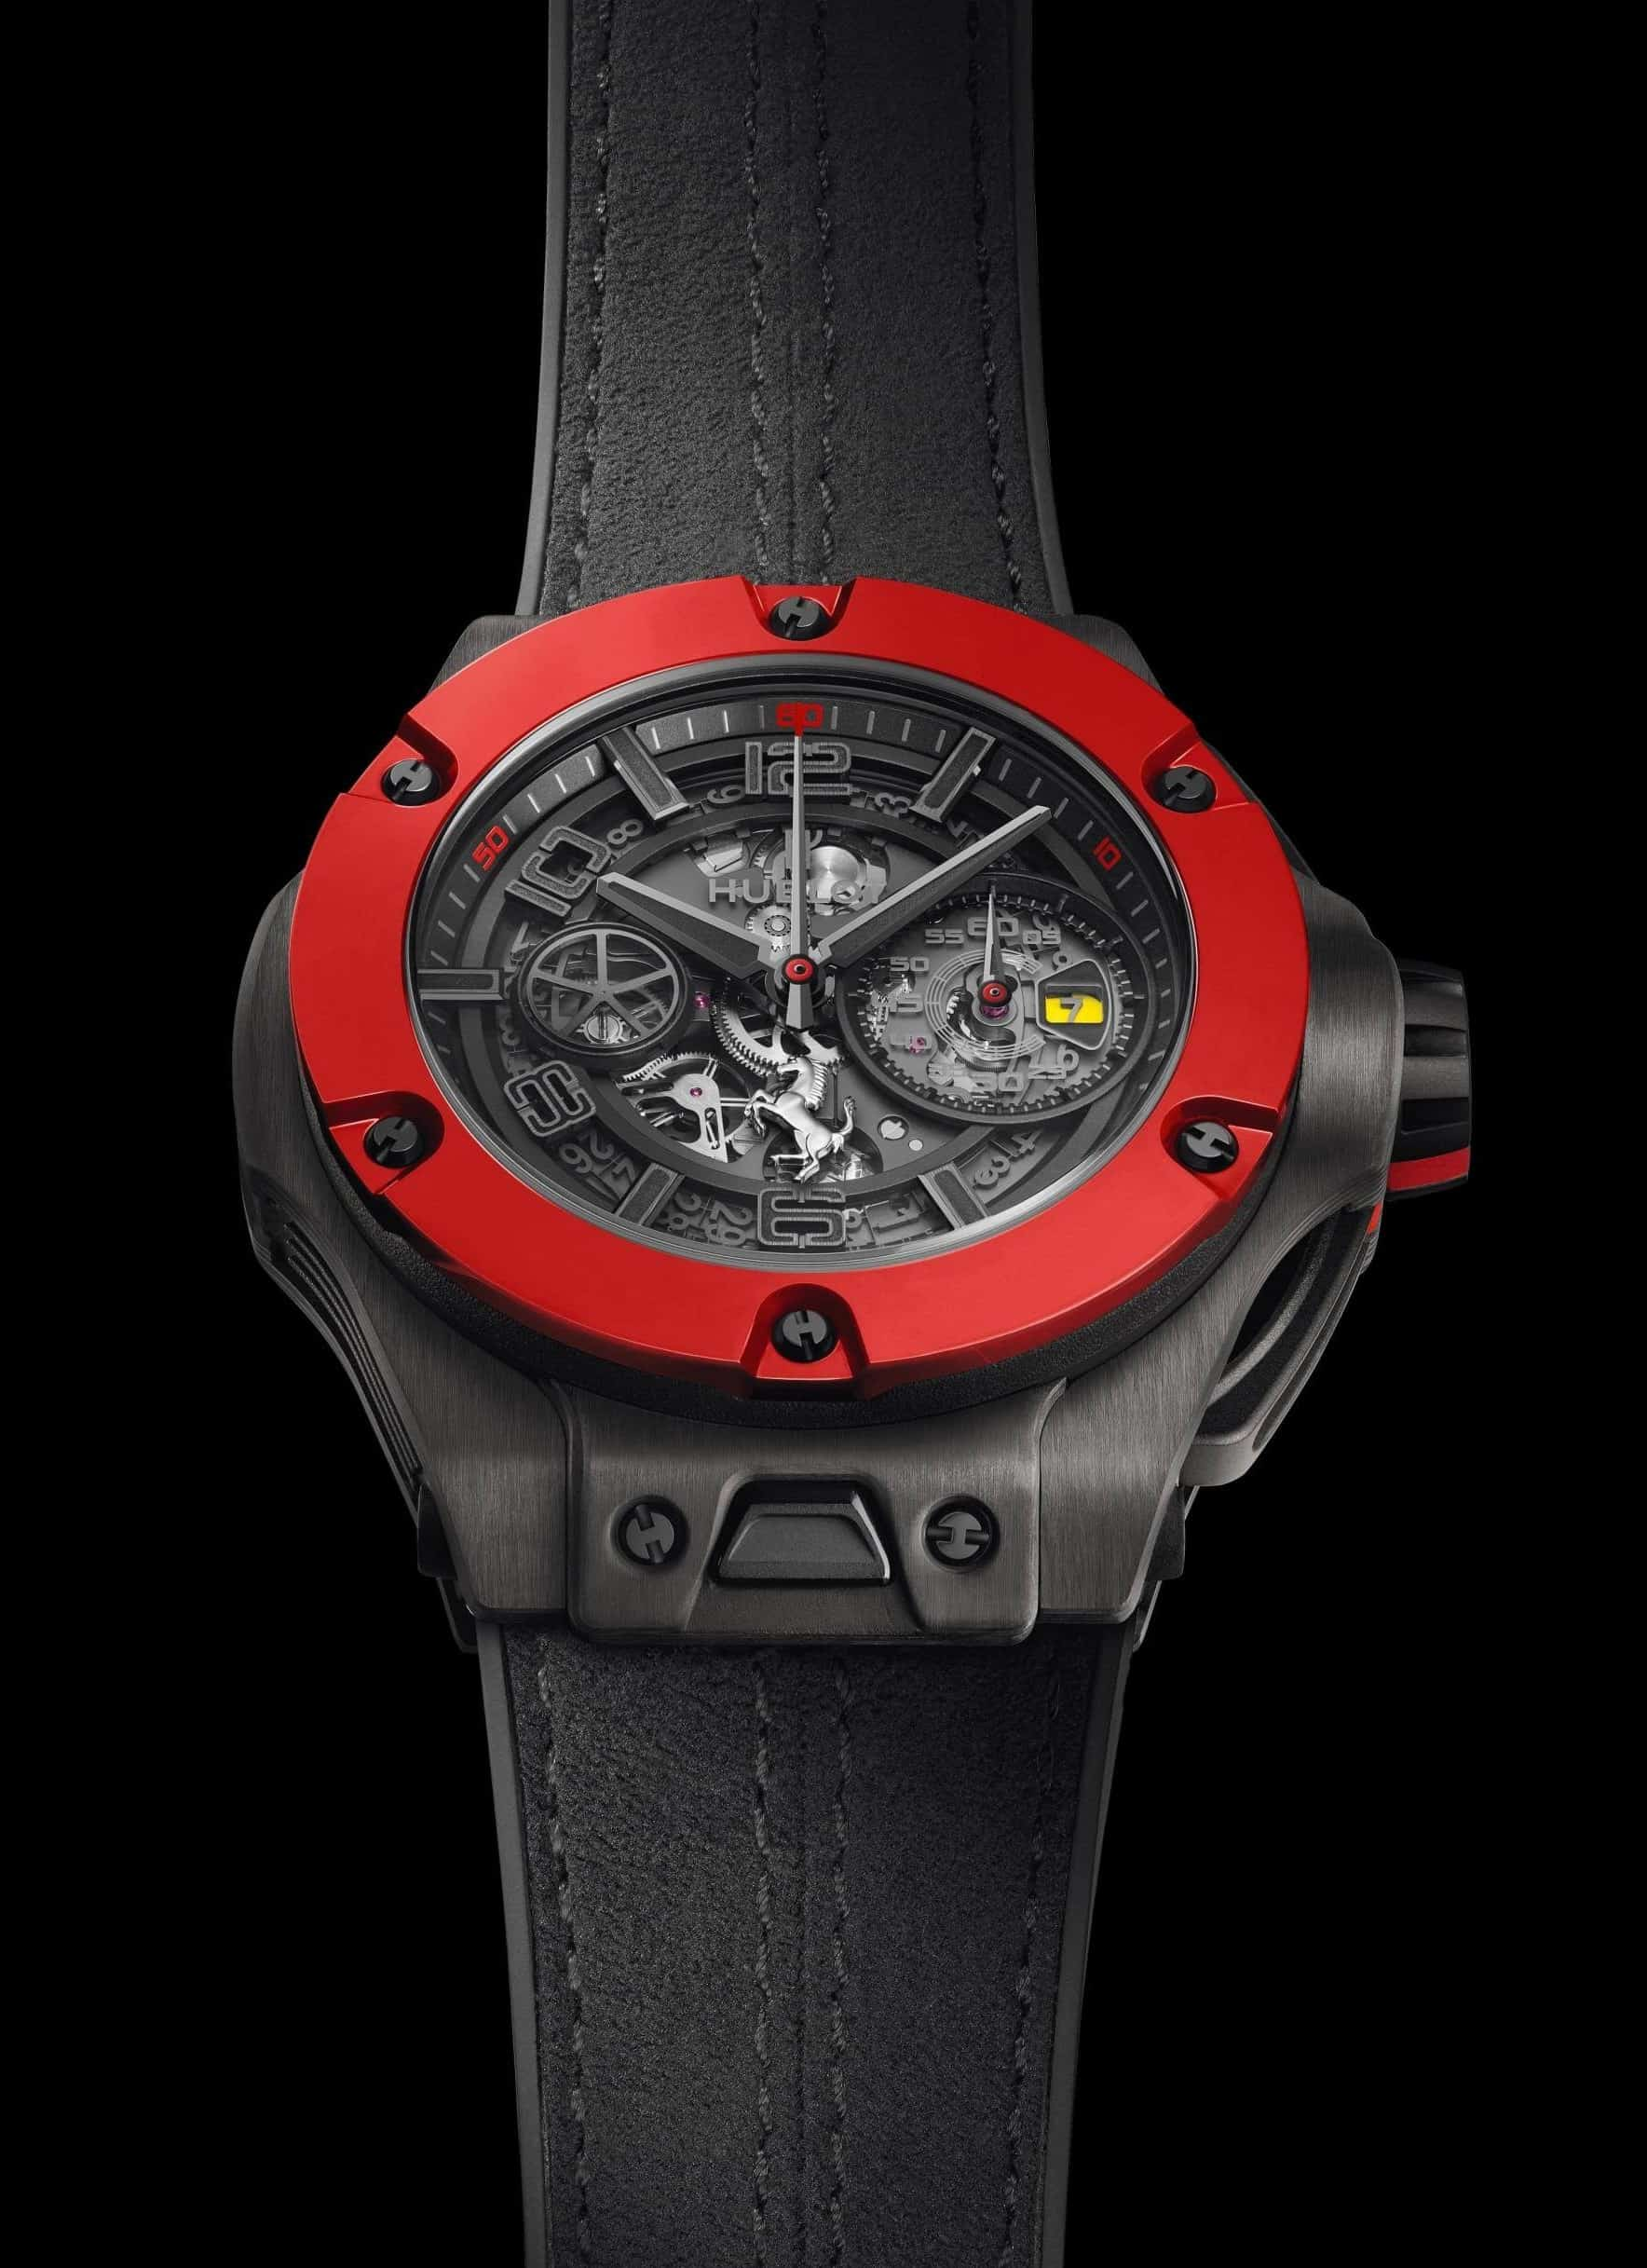 Ein Formel 1 Chronograph im besten Ferrari-Rot - die Hublot Big Bang Ferrari Unico Carbon in 45 mm